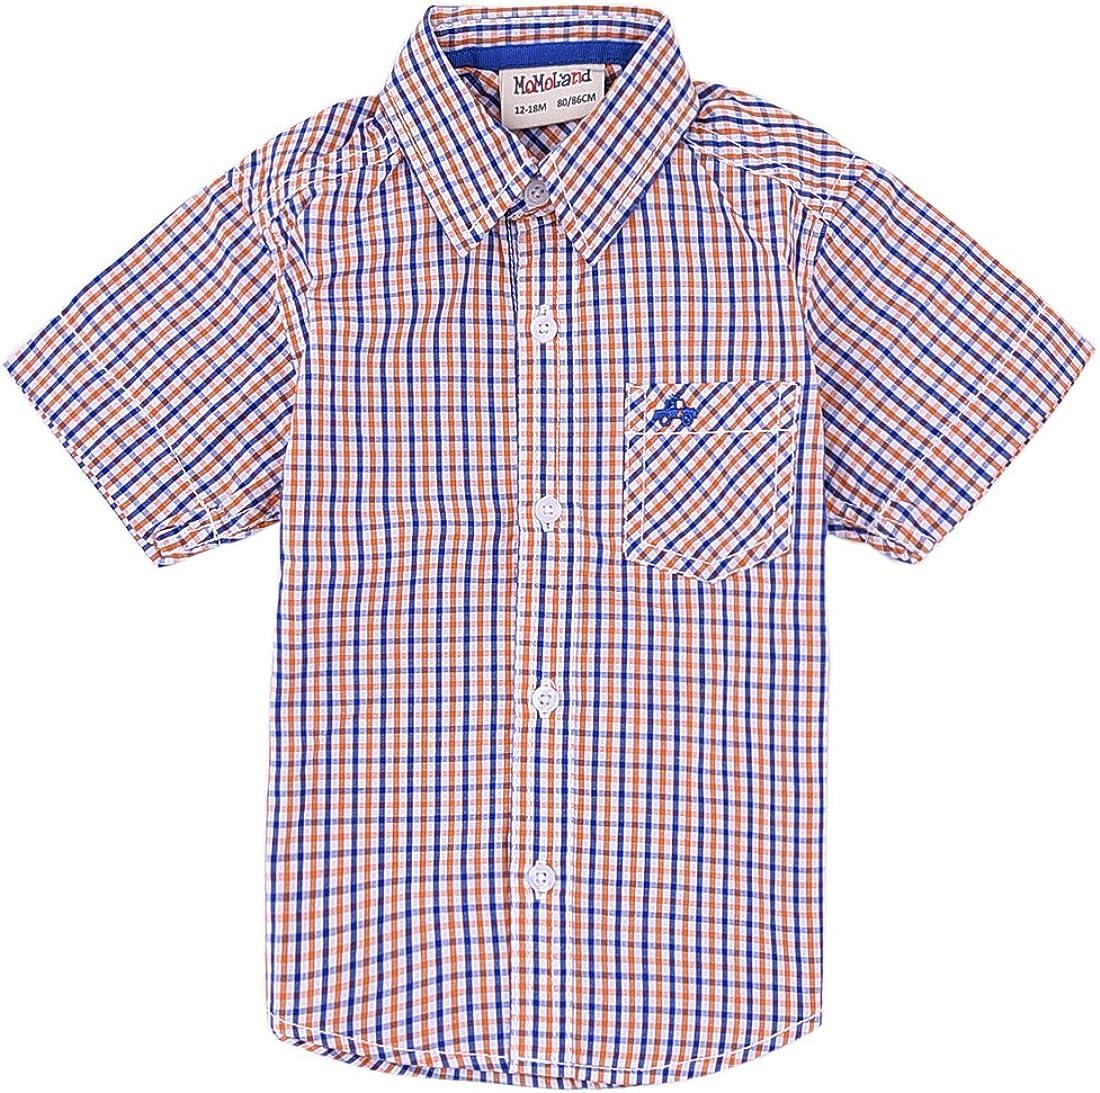 MOMOLAND Baby Boys' free shipping Max 69% OFF Plaid Woven Orange Sleeve Shirt Short